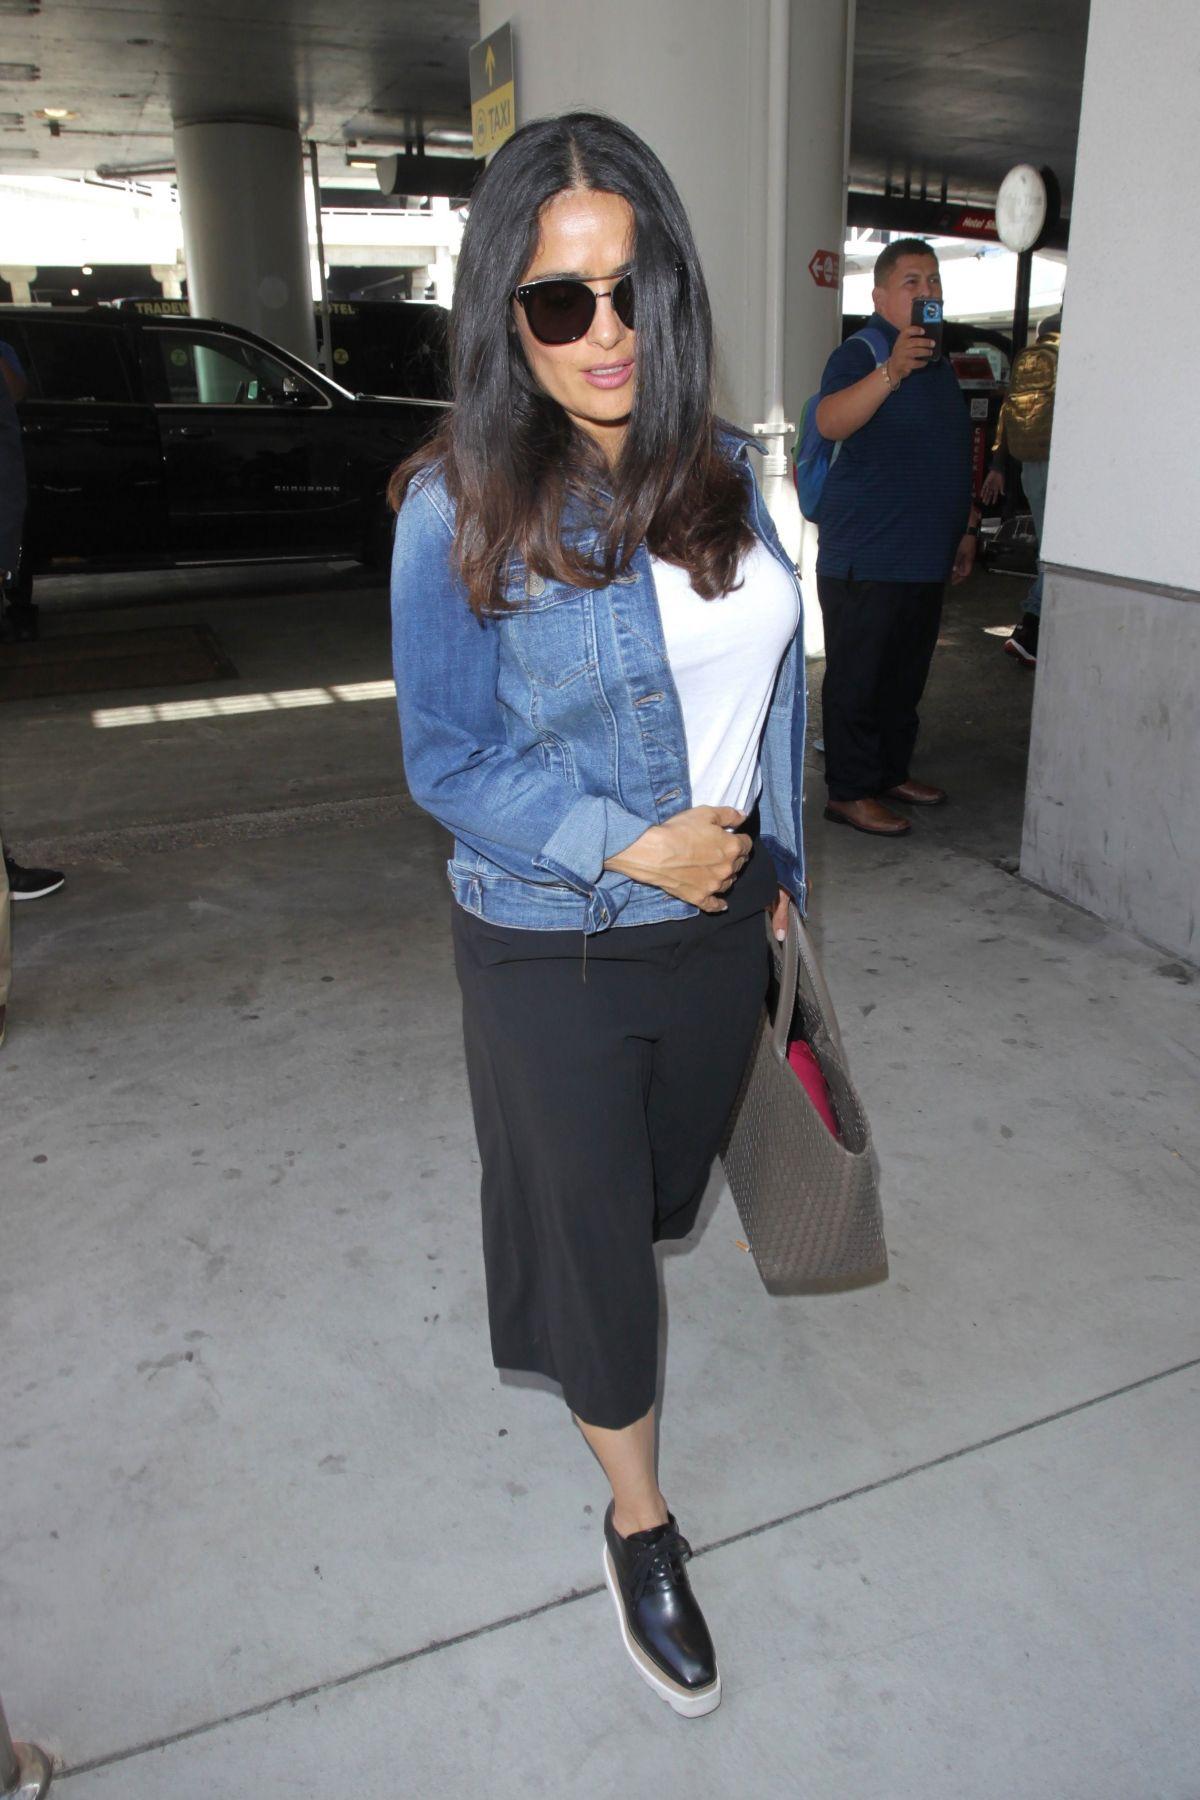 SALMA HAYEK at Los Angeles International Airport 06/15/2017